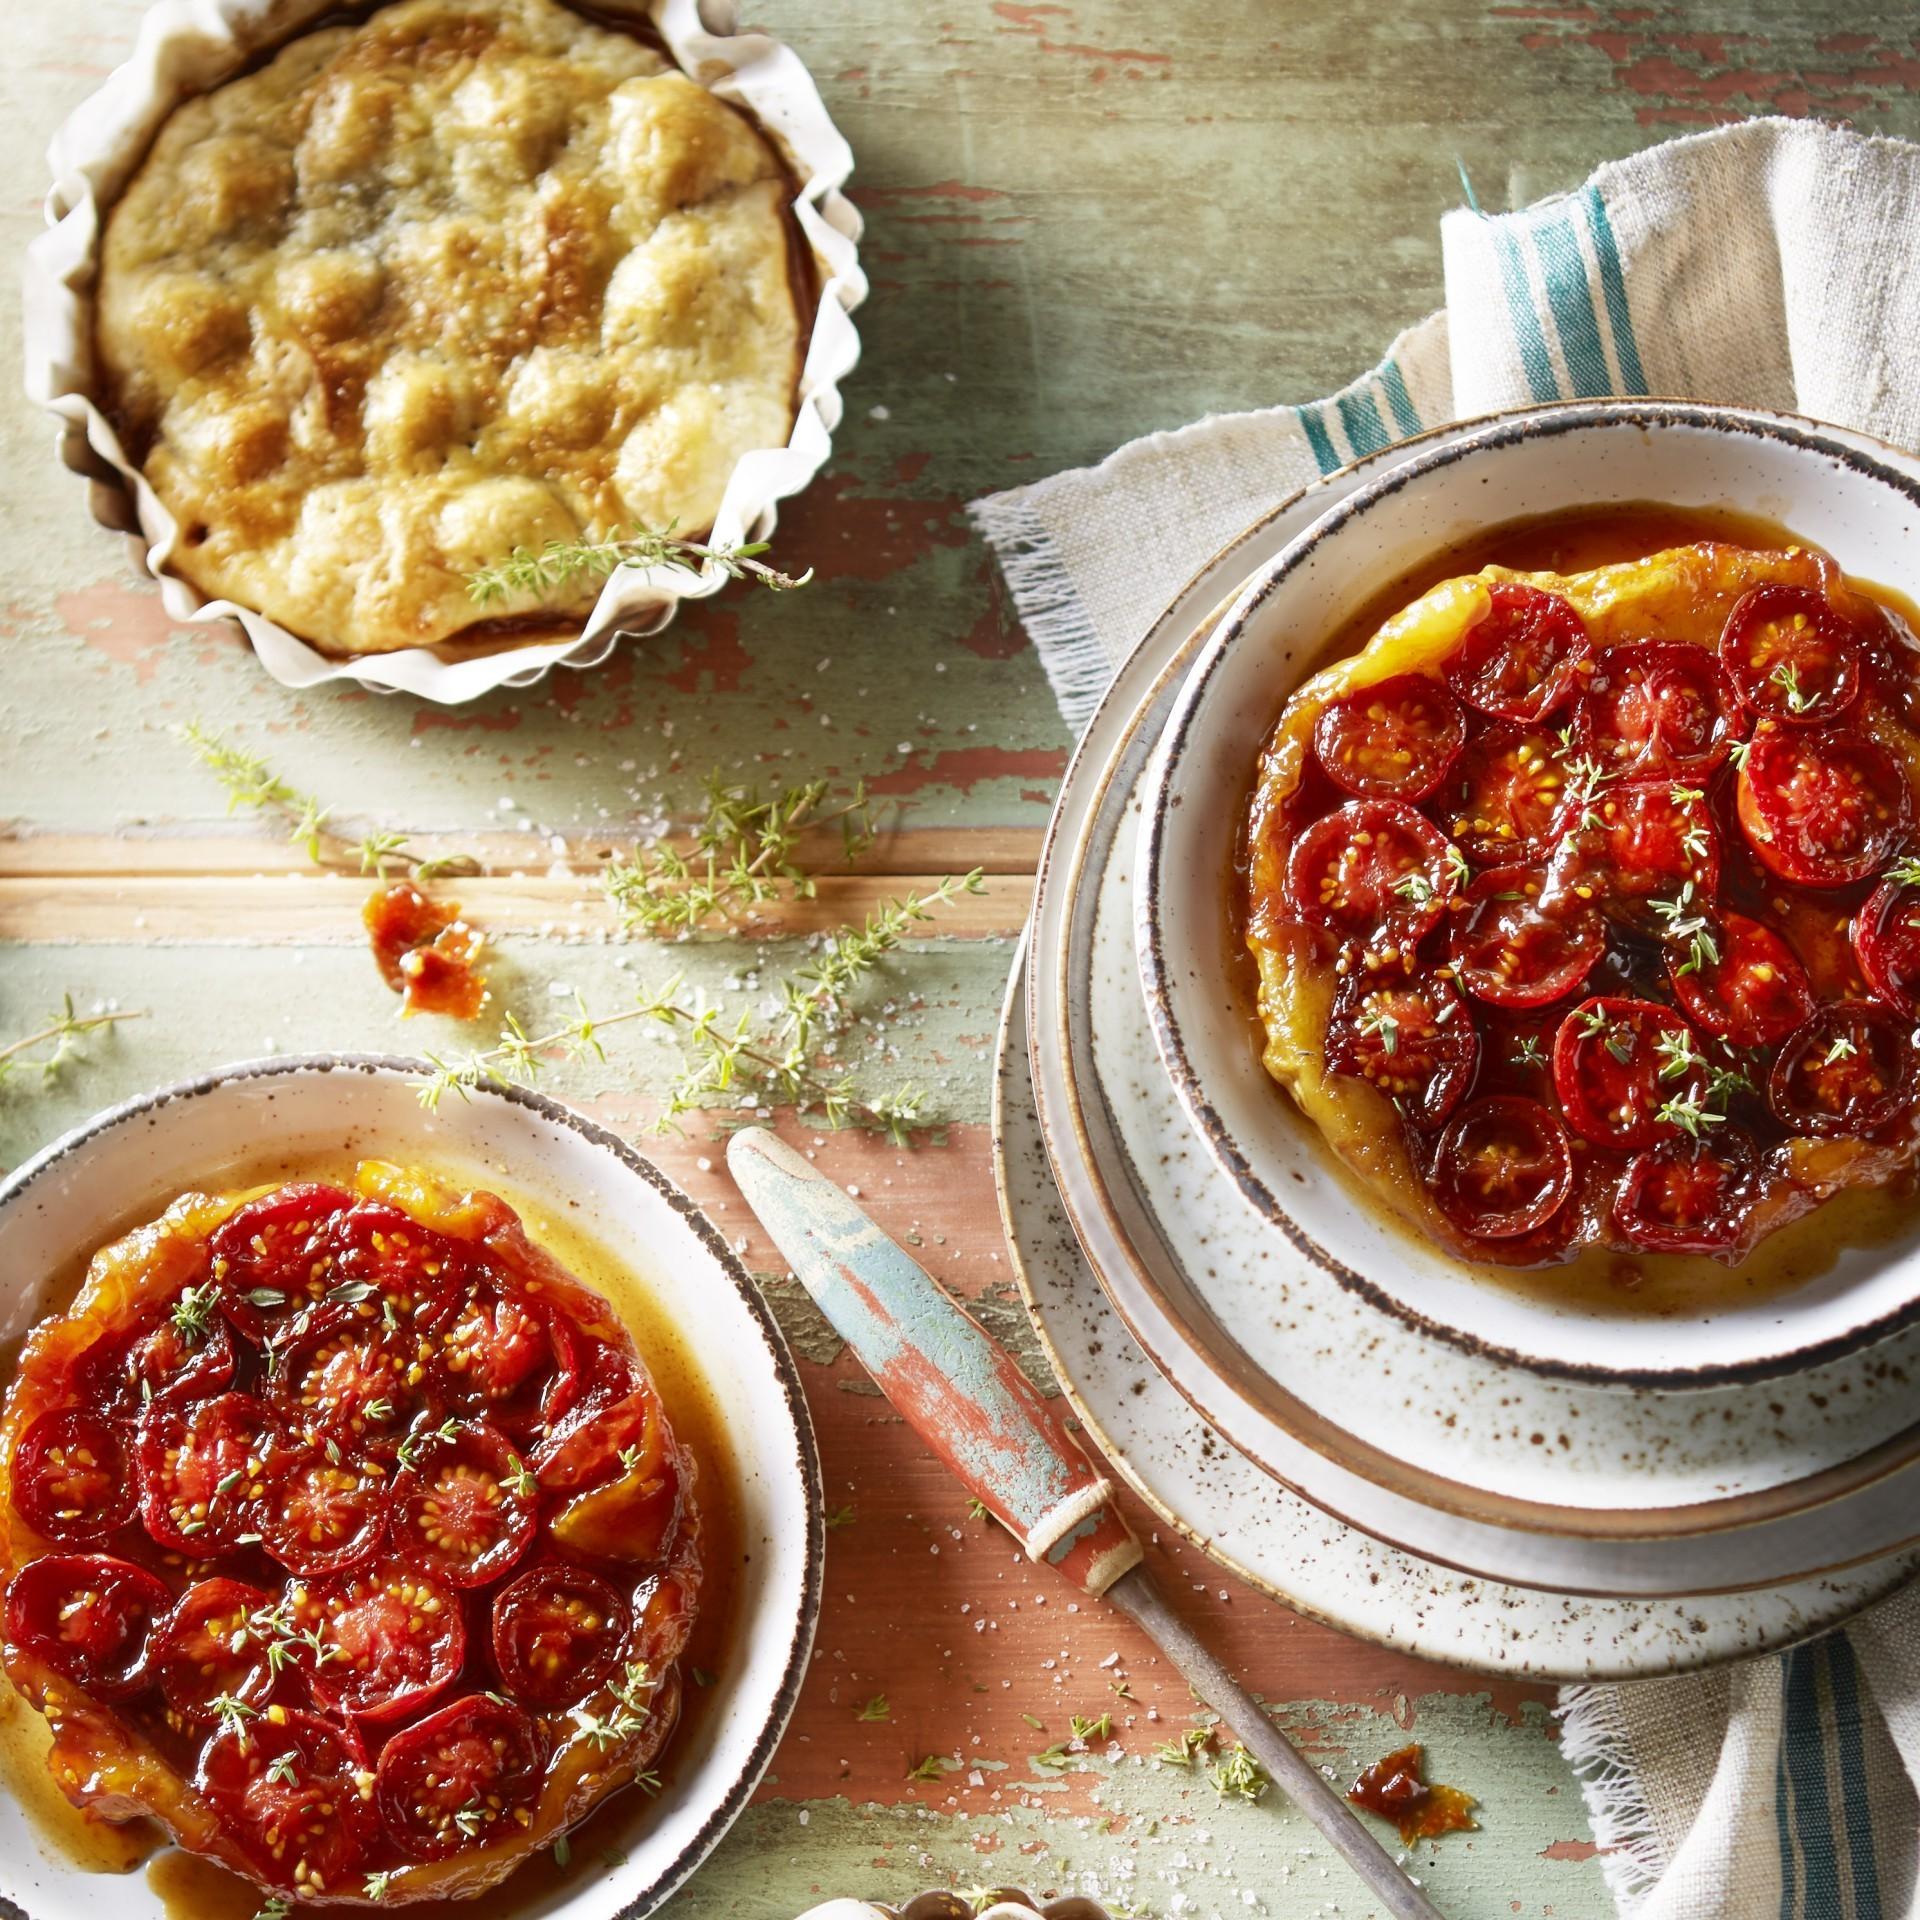 Balsamik sirke ile asma domates tarte tatin